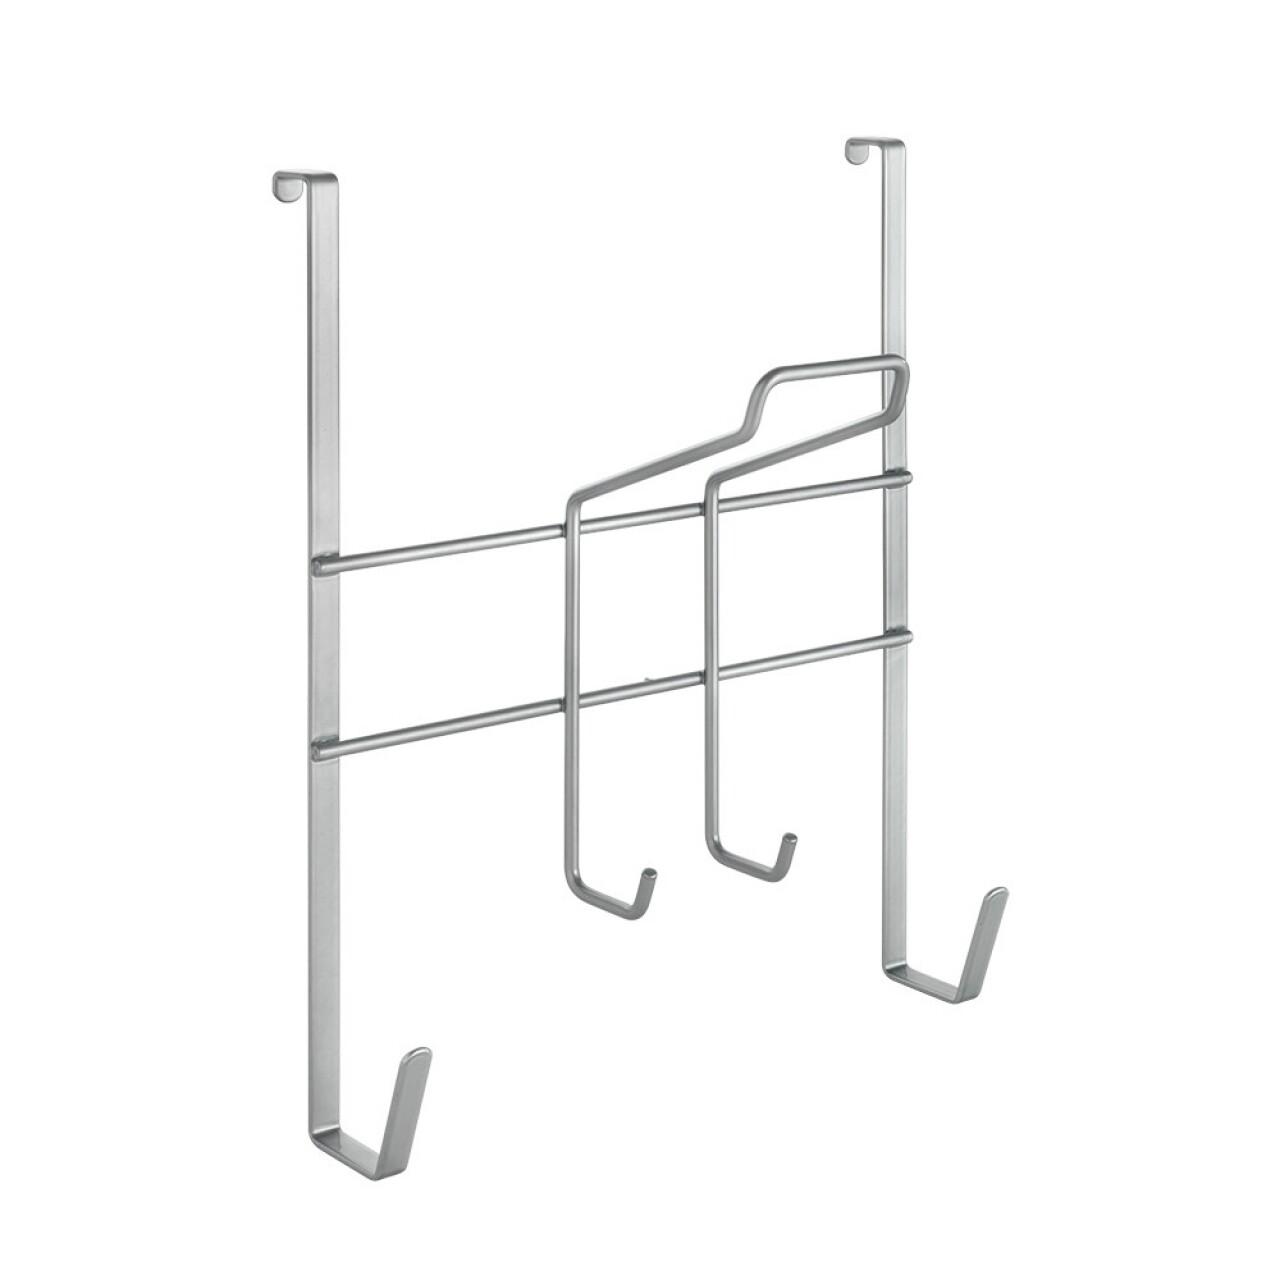 Suport masa si fier de calcat pentru usa, Metaltex, 14 x 28 x 34 cm, inox/invelis Polytherm, argintiu